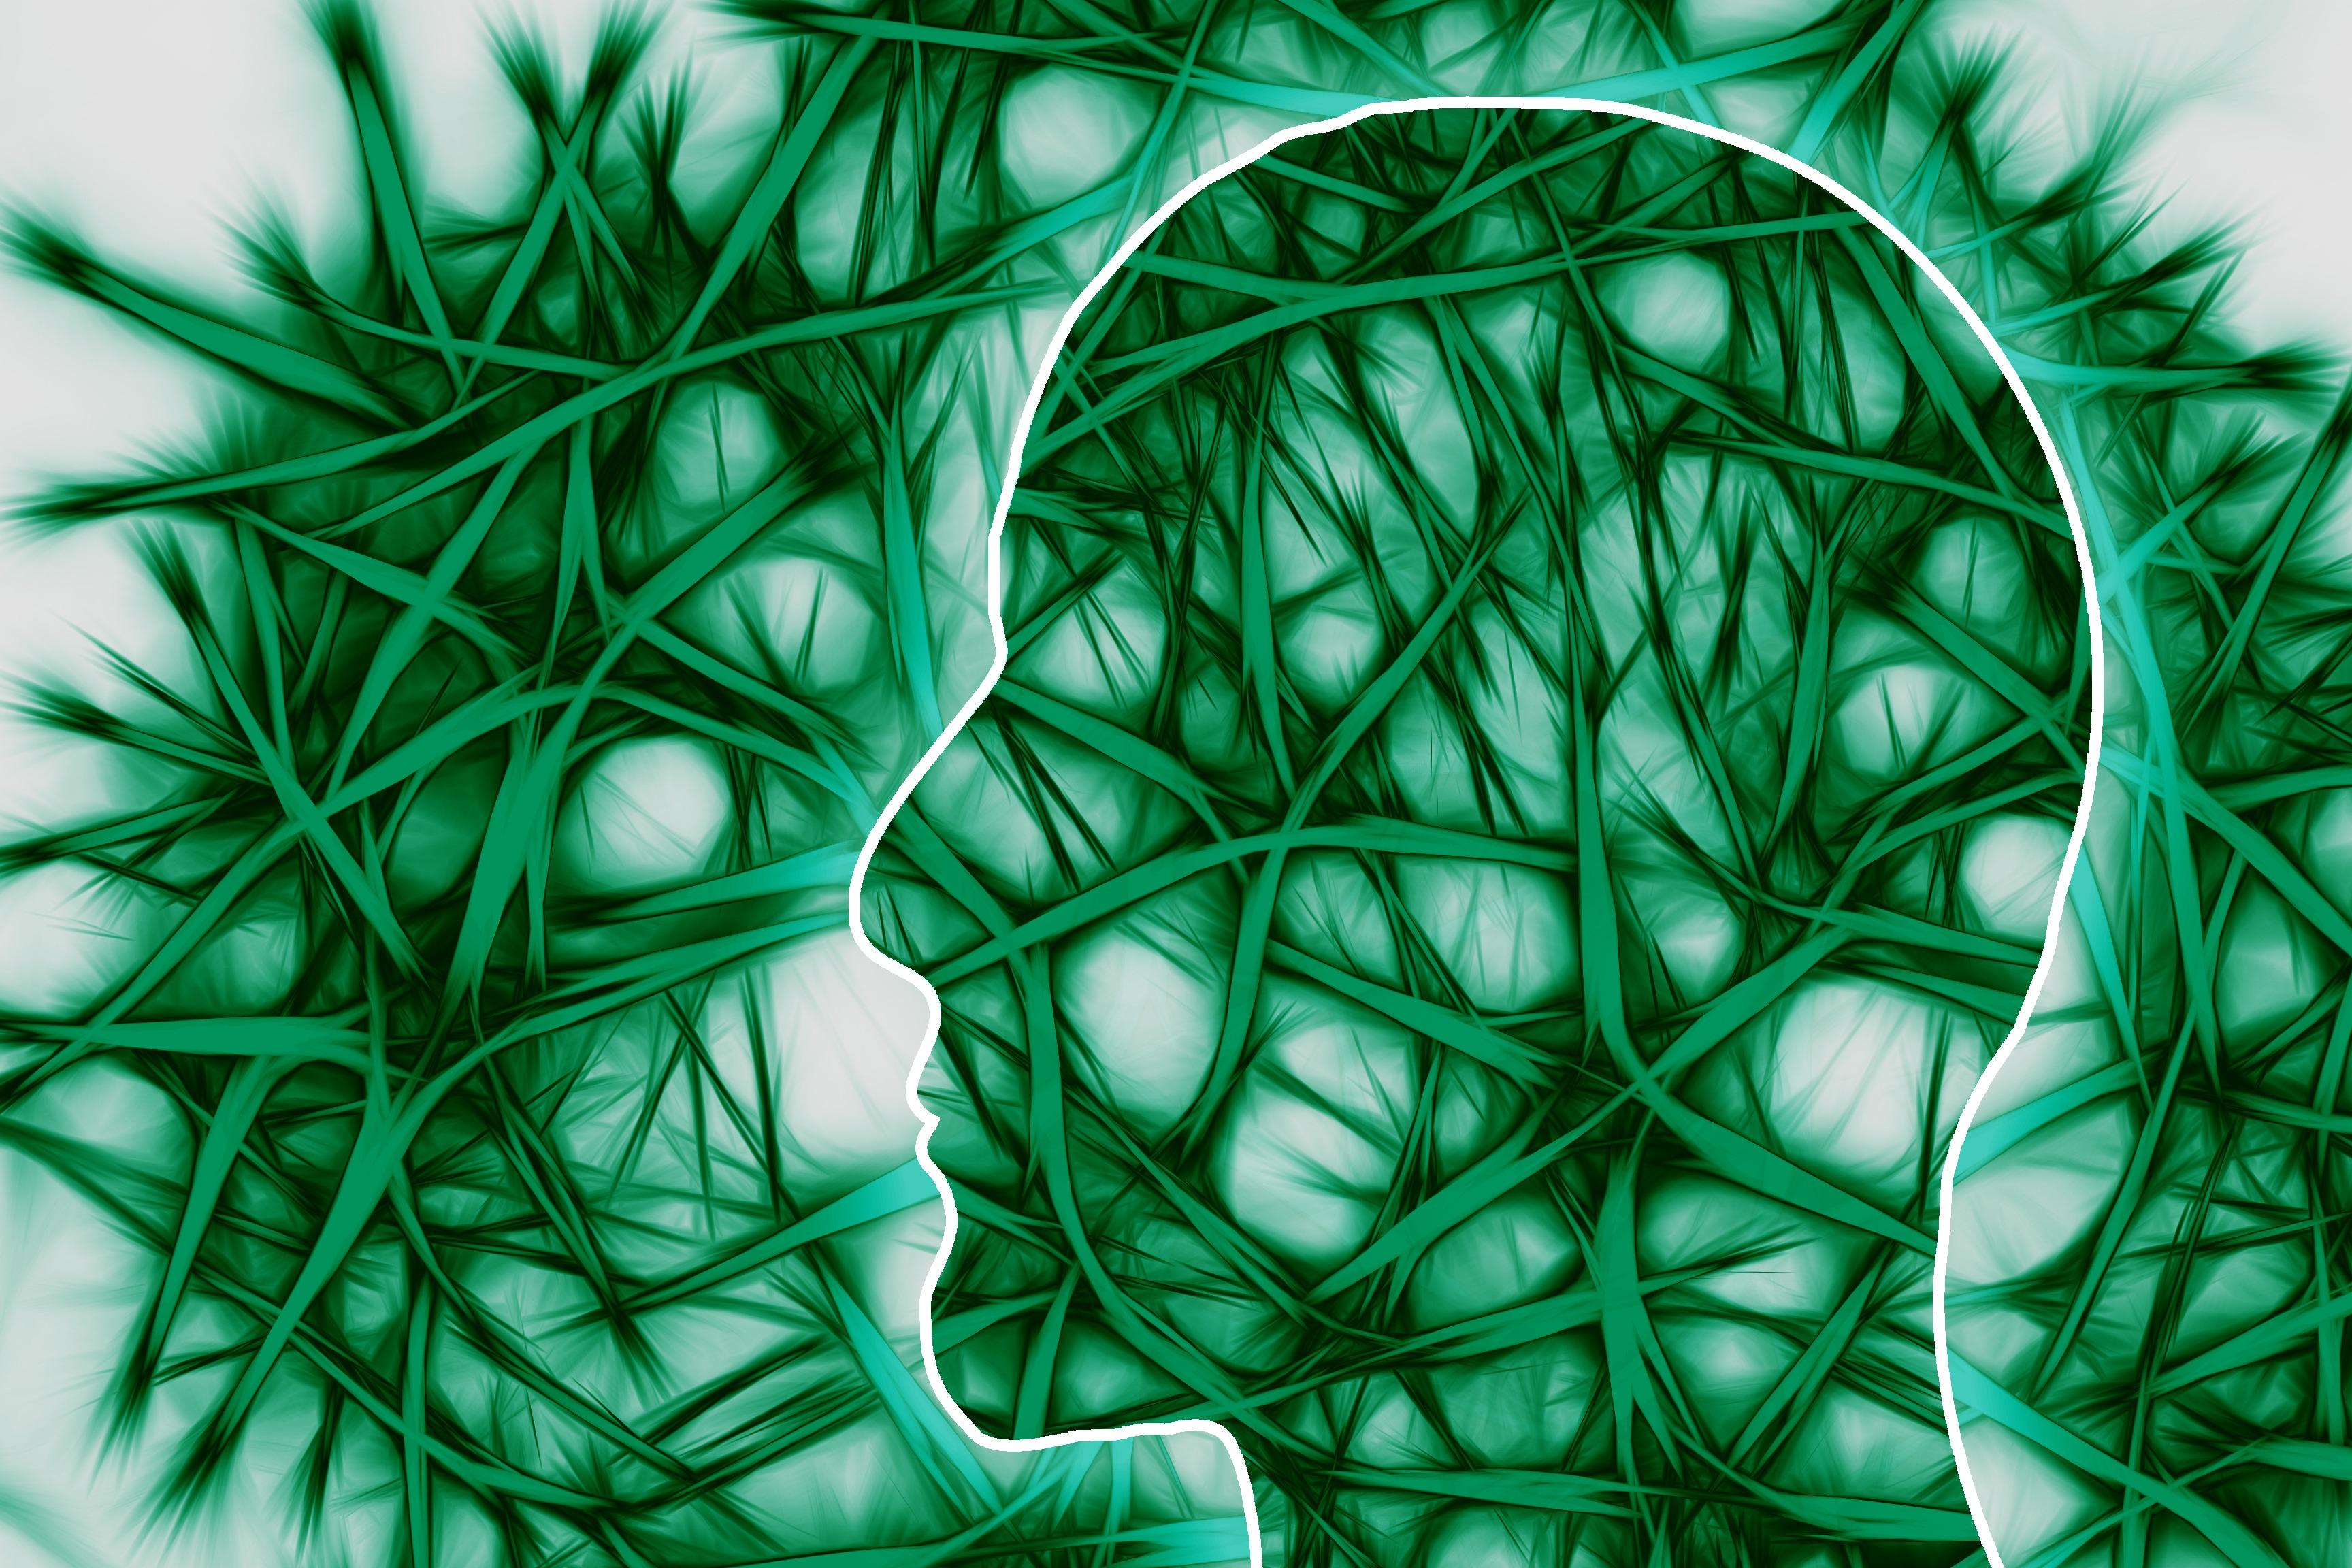 neural-pathways-221718.jpg